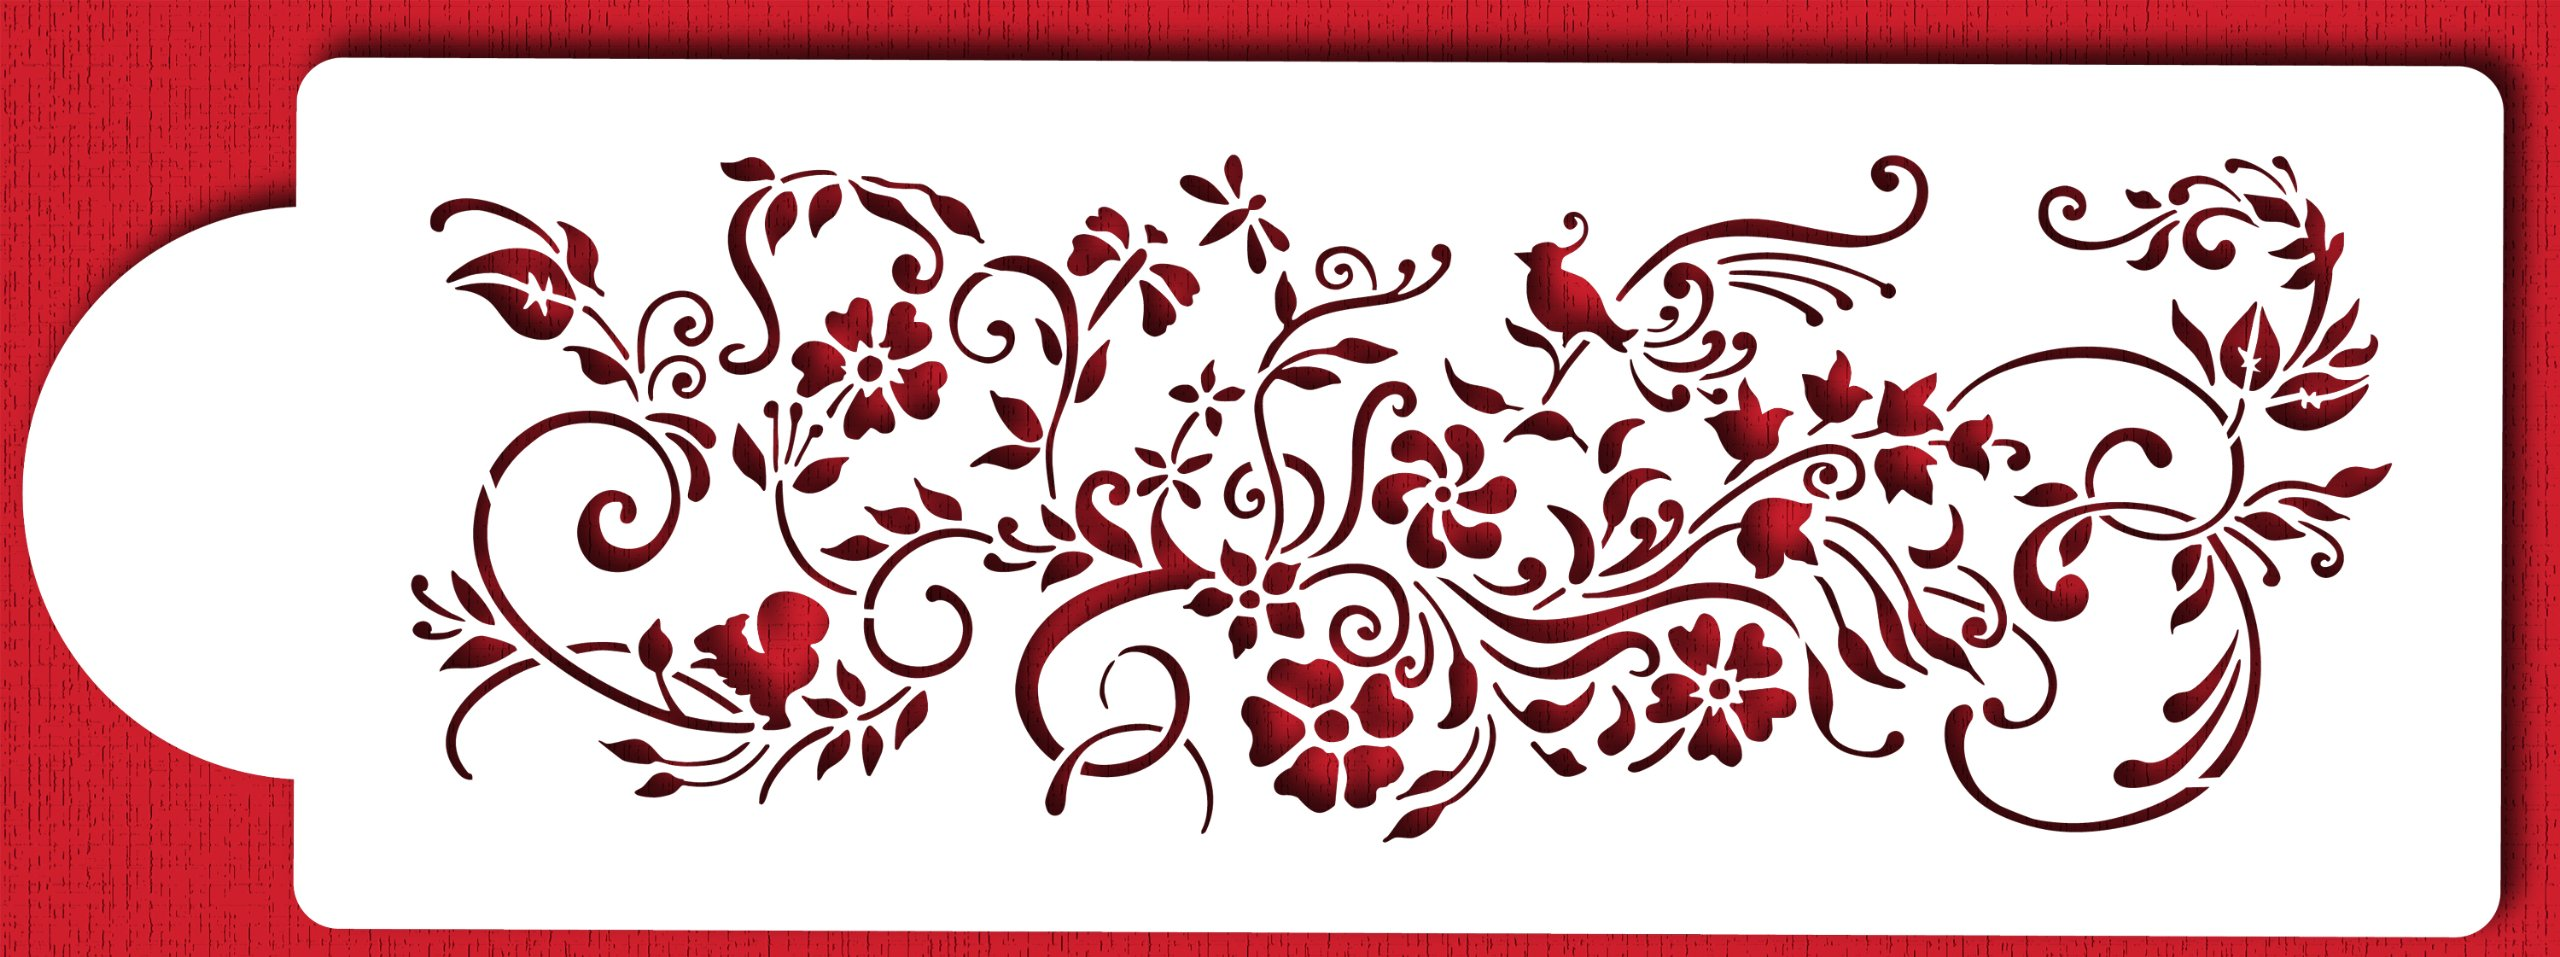 Designer Stencils C431 Nature's Vignette Cake Stencil, Beige/semi-transparent